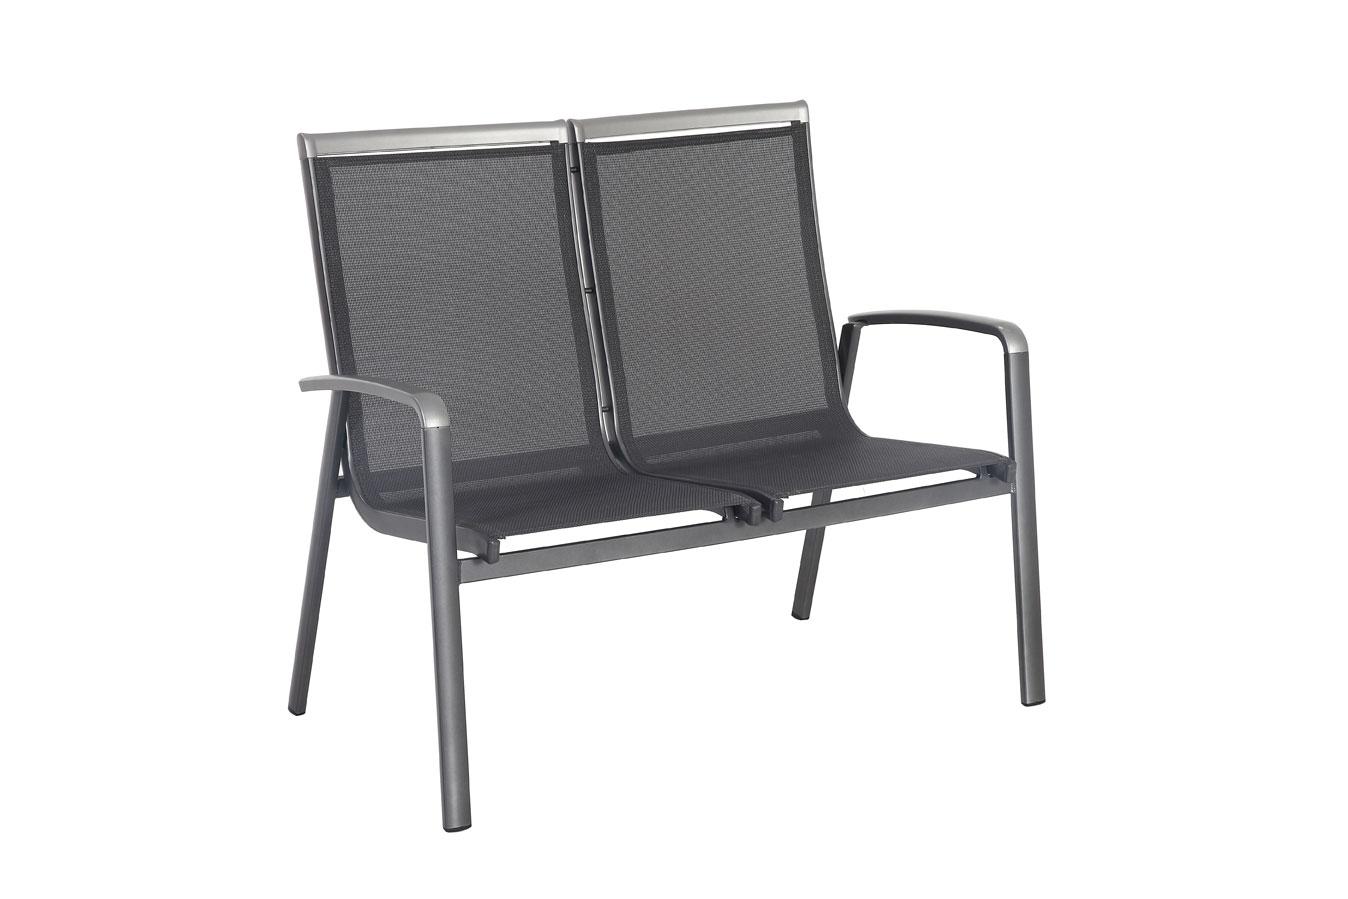 2 Sitzer Gartenbank